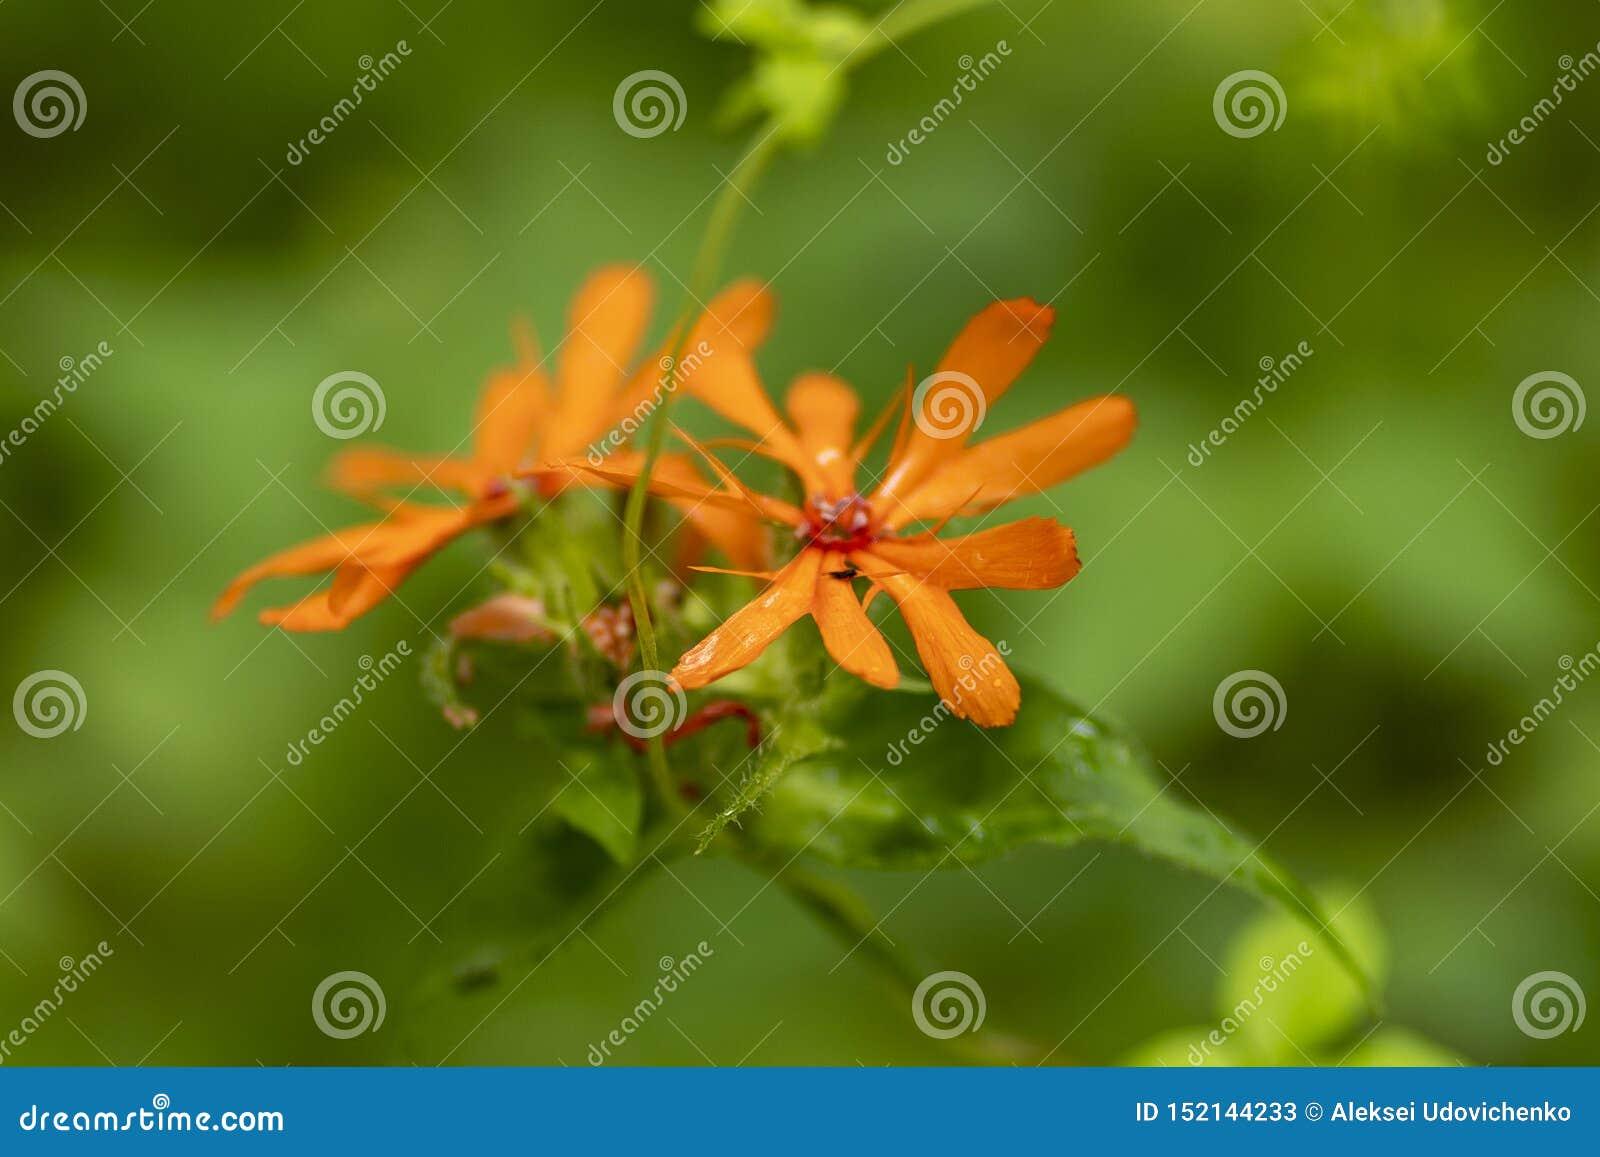 Tiro macro de la flor anaranjada en foco suave